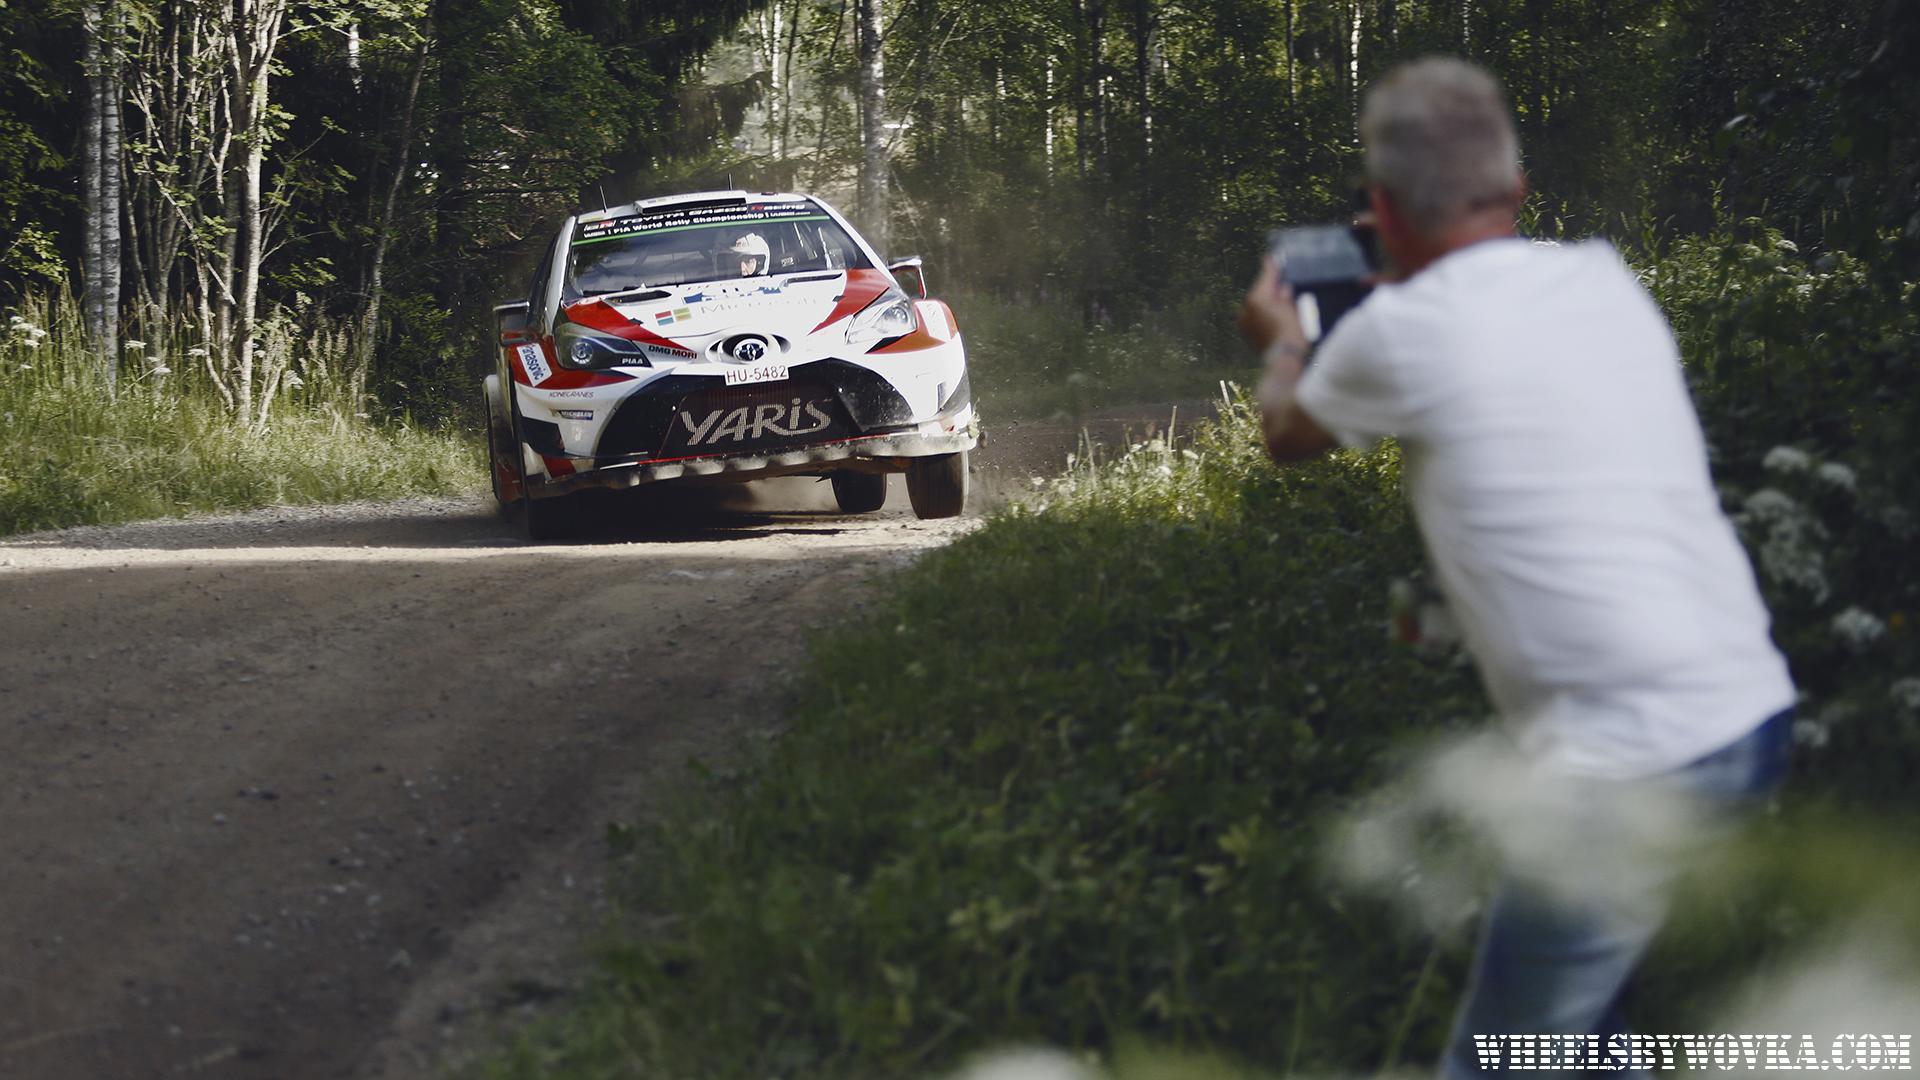 wrc-neste-rally-finalnd-2017-by-wheelsbywovka-12